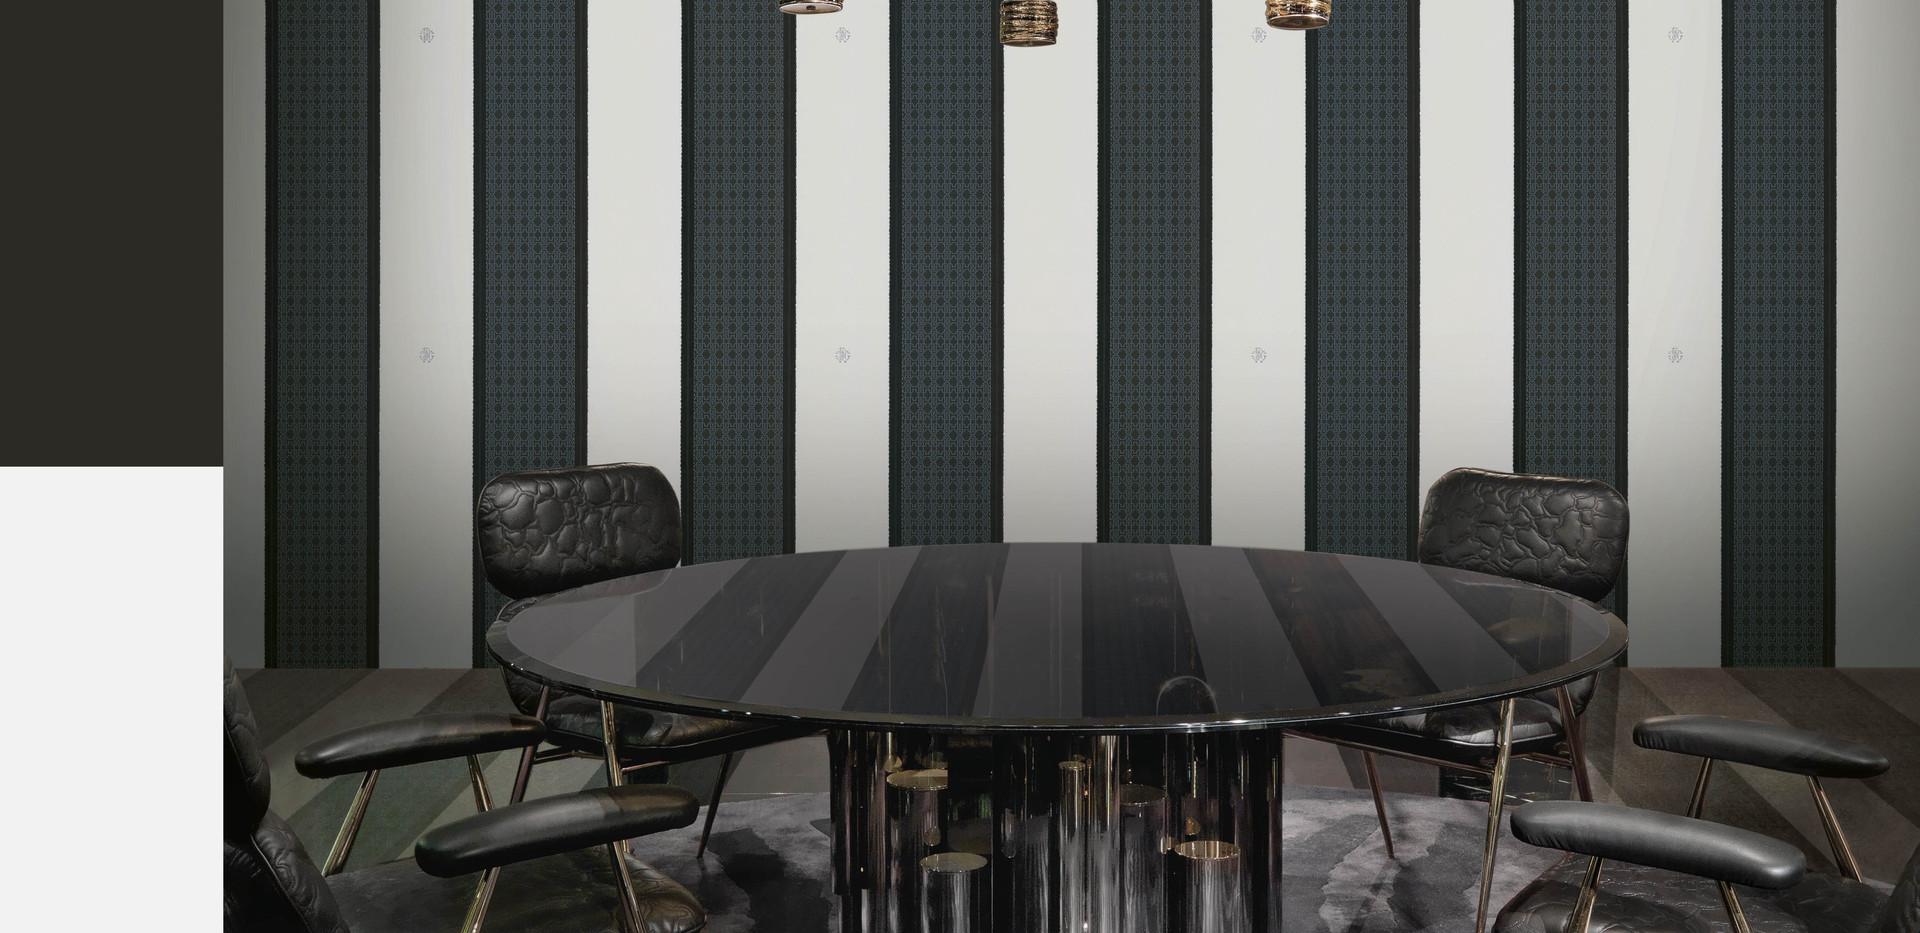 LifeNcolors-best-wallpaper-branded-luxury-pattern-stripes-darkgrey-light